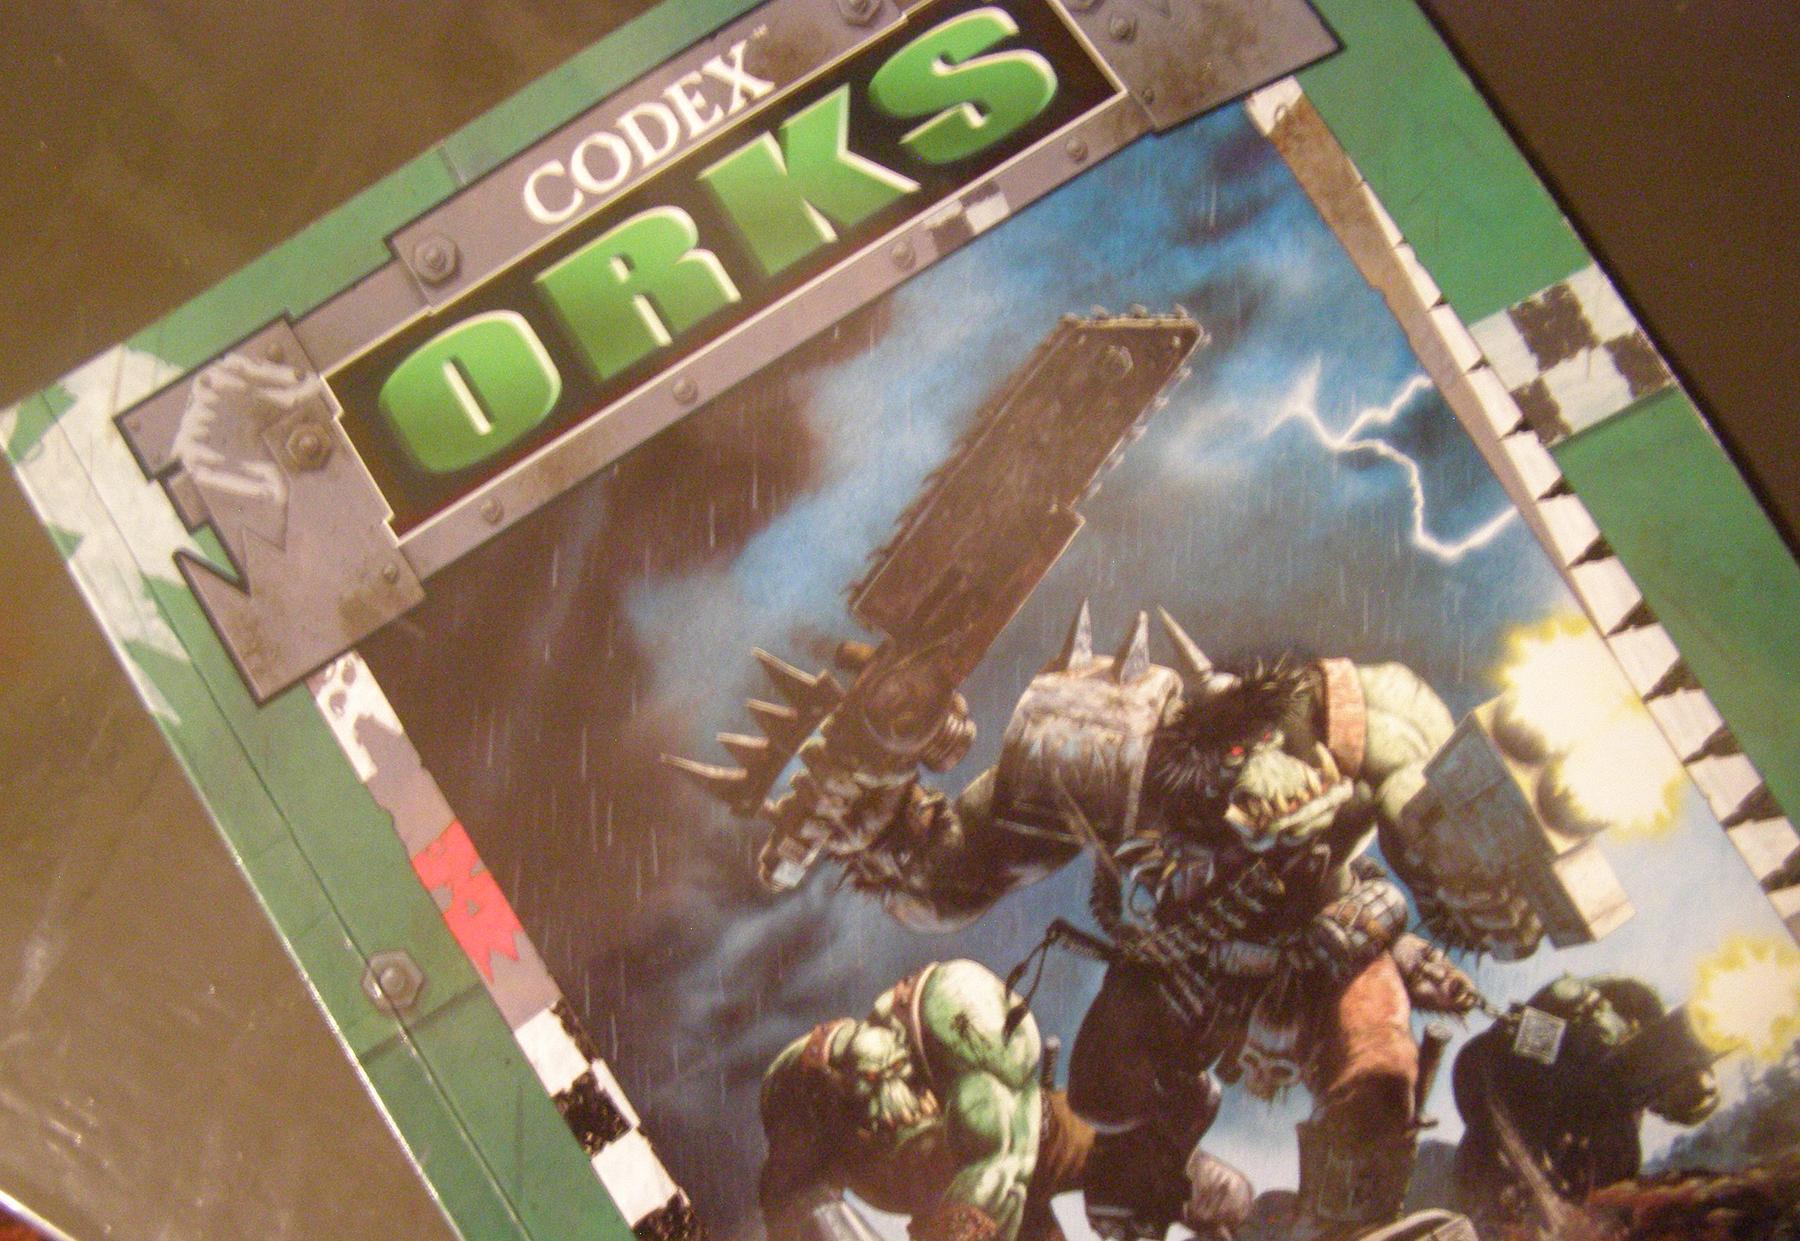 Codex, Orks, Warhammer 40,000